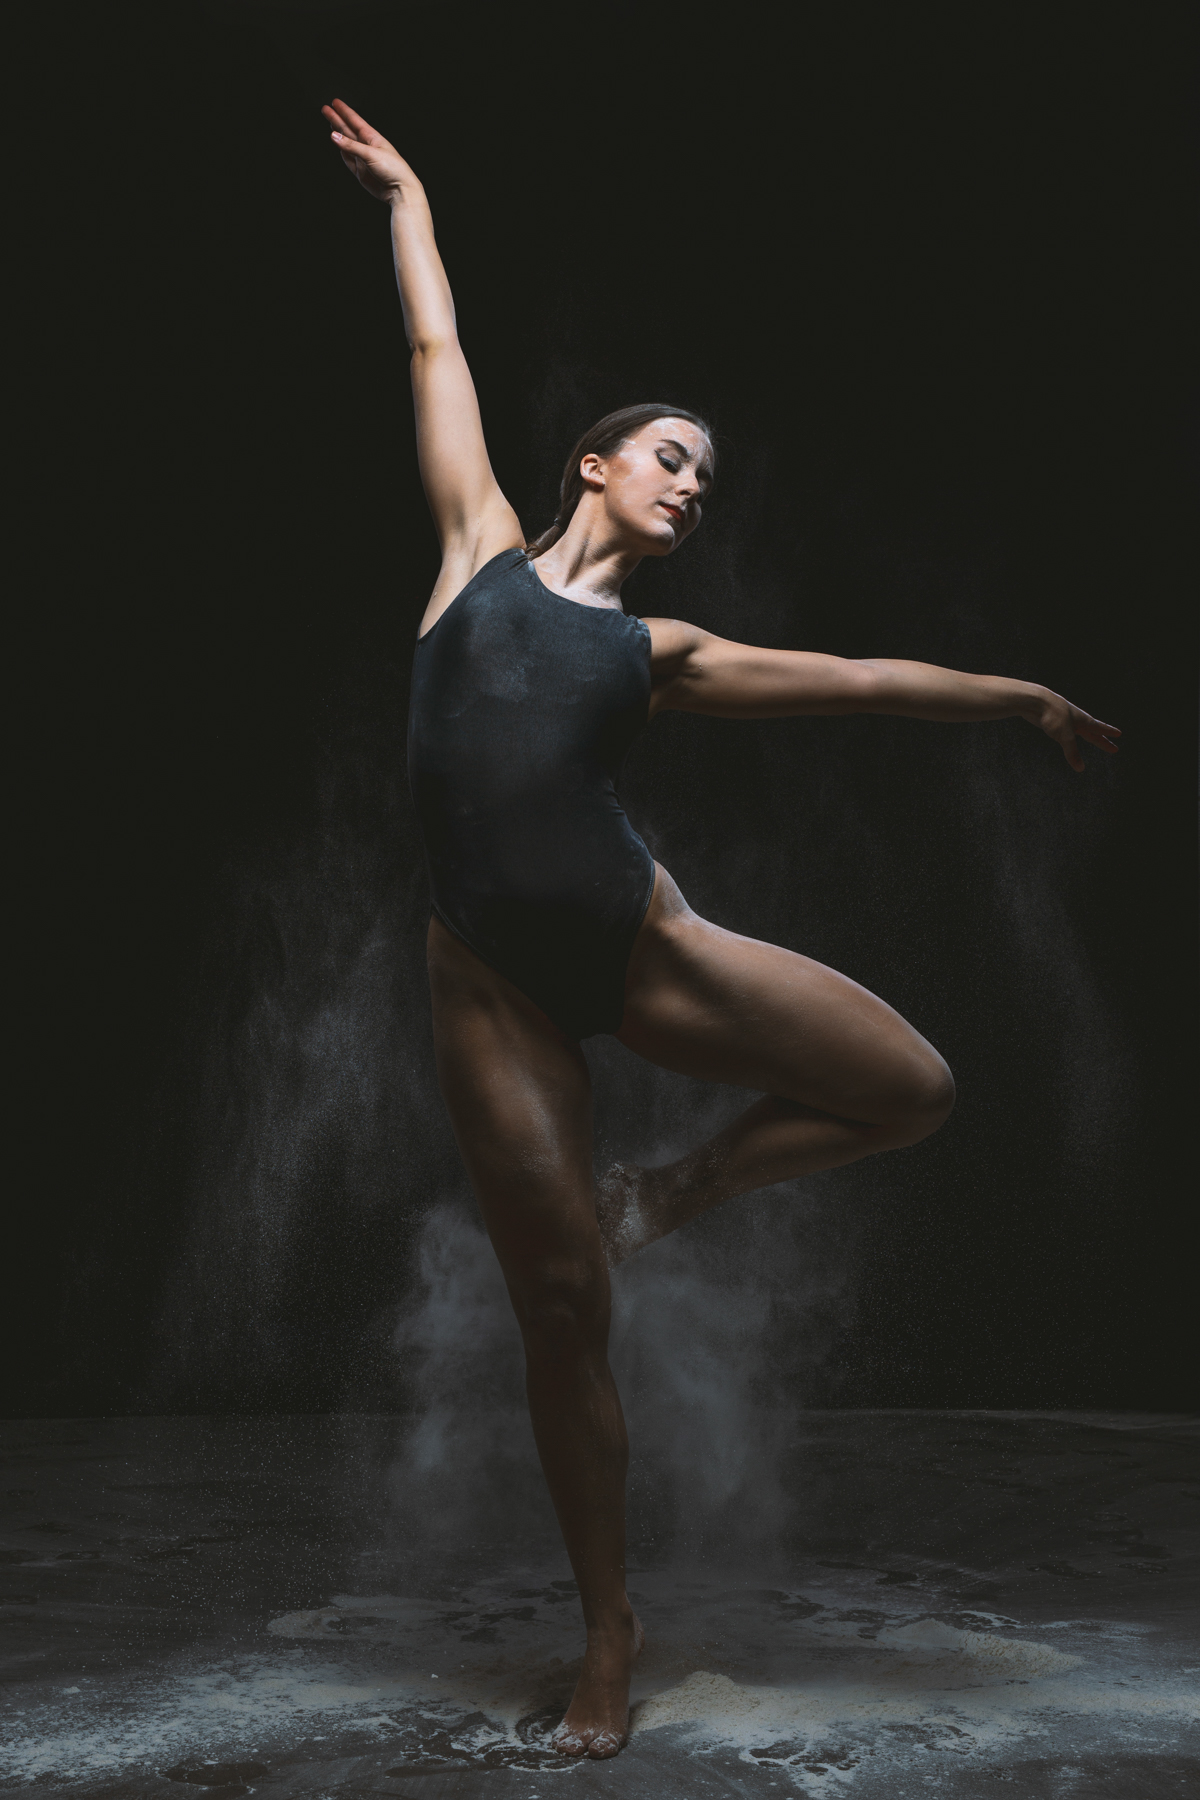 Reportajes fotos para bailarinas